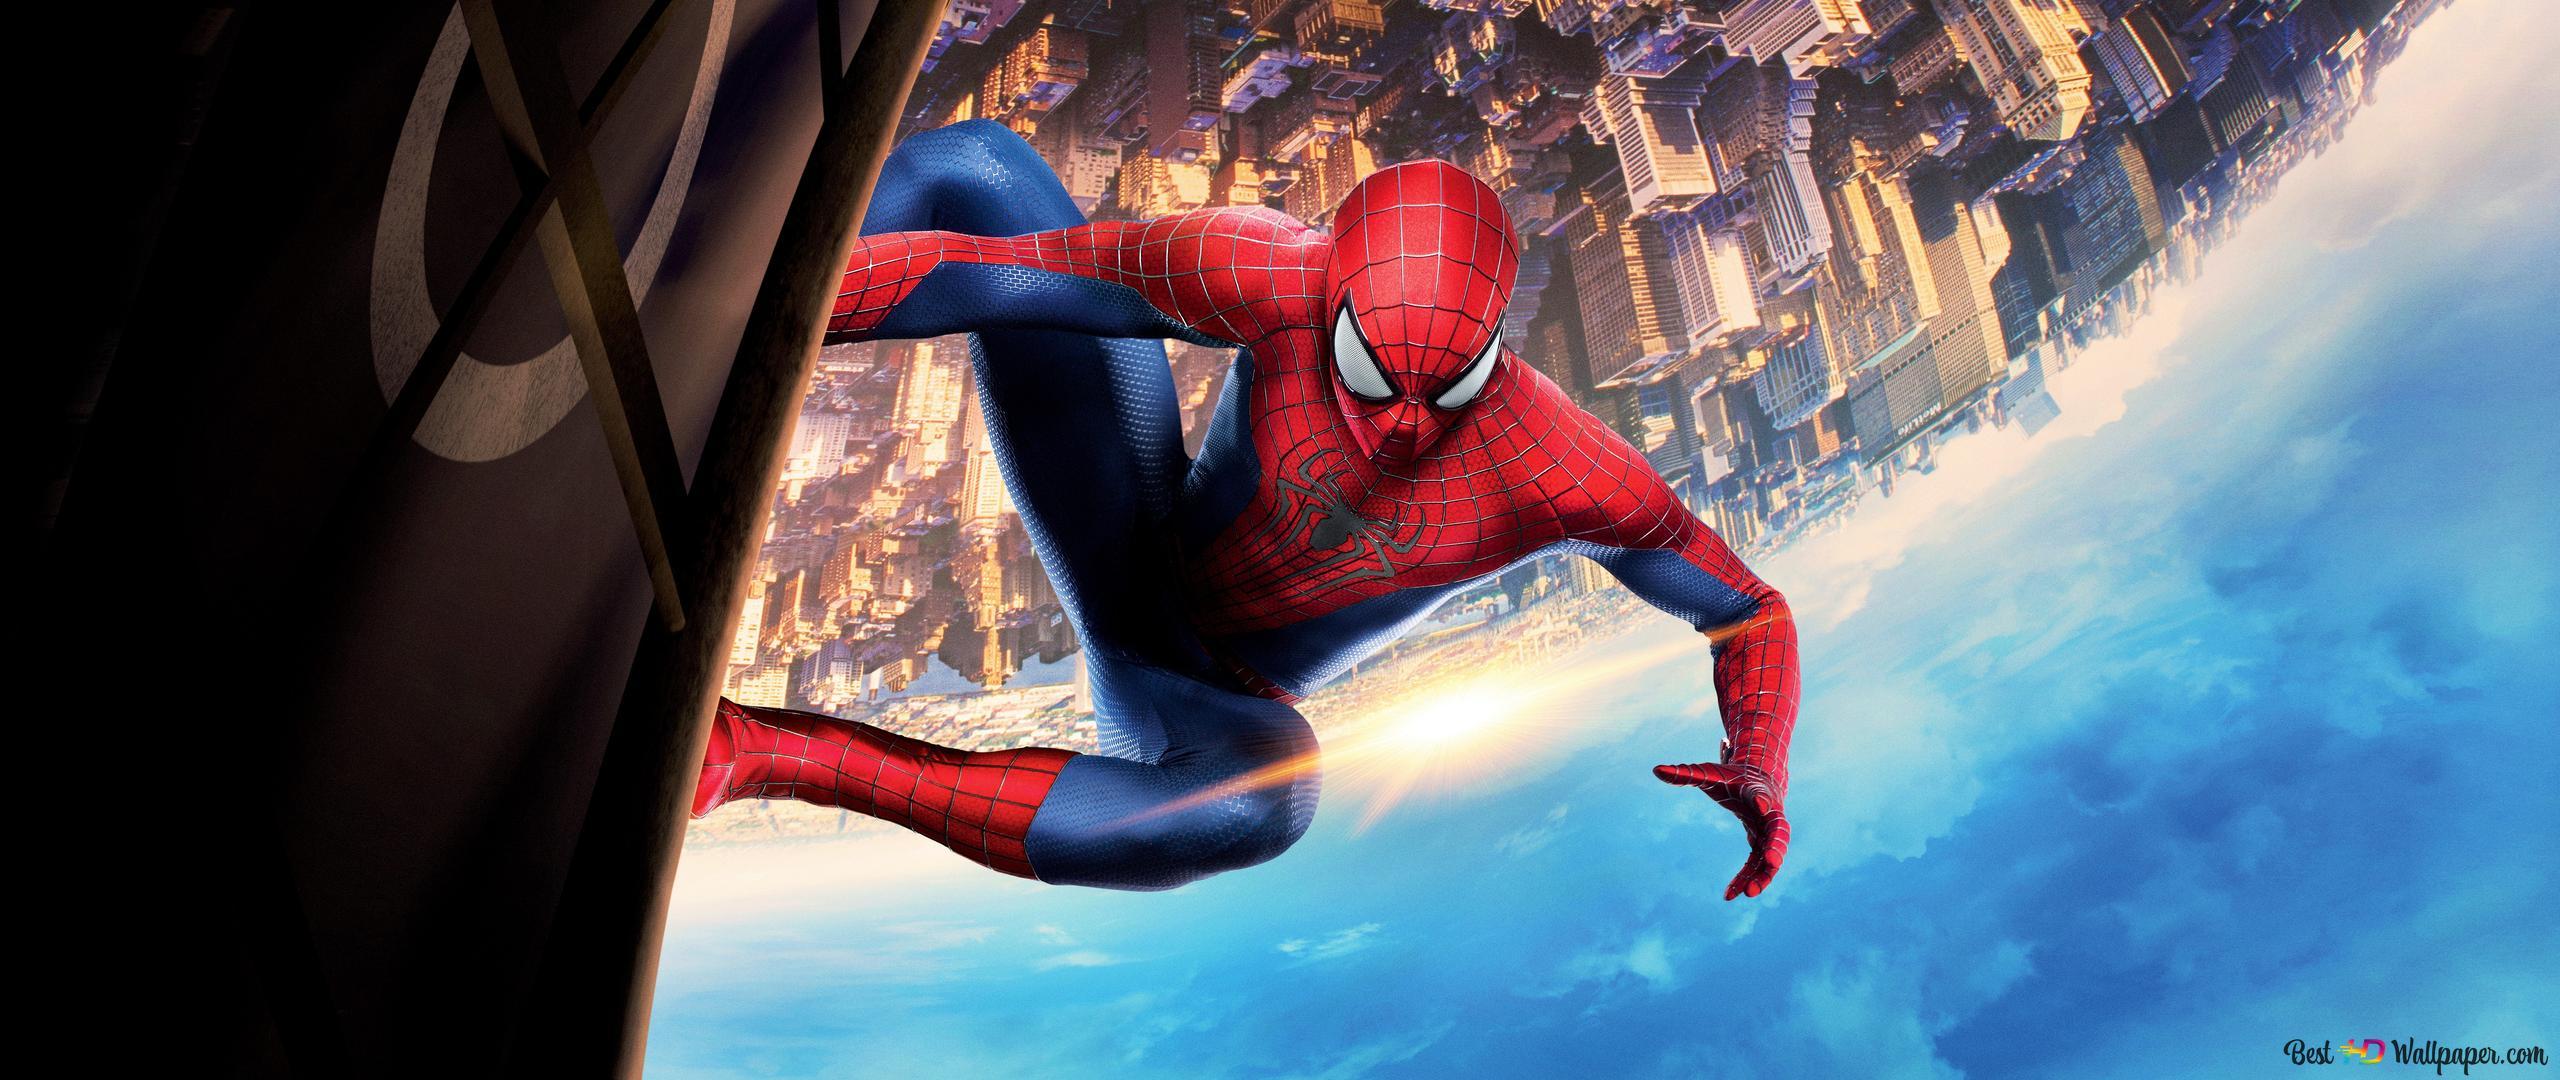 Nolan Batman vs Webb Spider-Man The-amazing-spider-man-2-wallpaper-2560x1080-26681_14